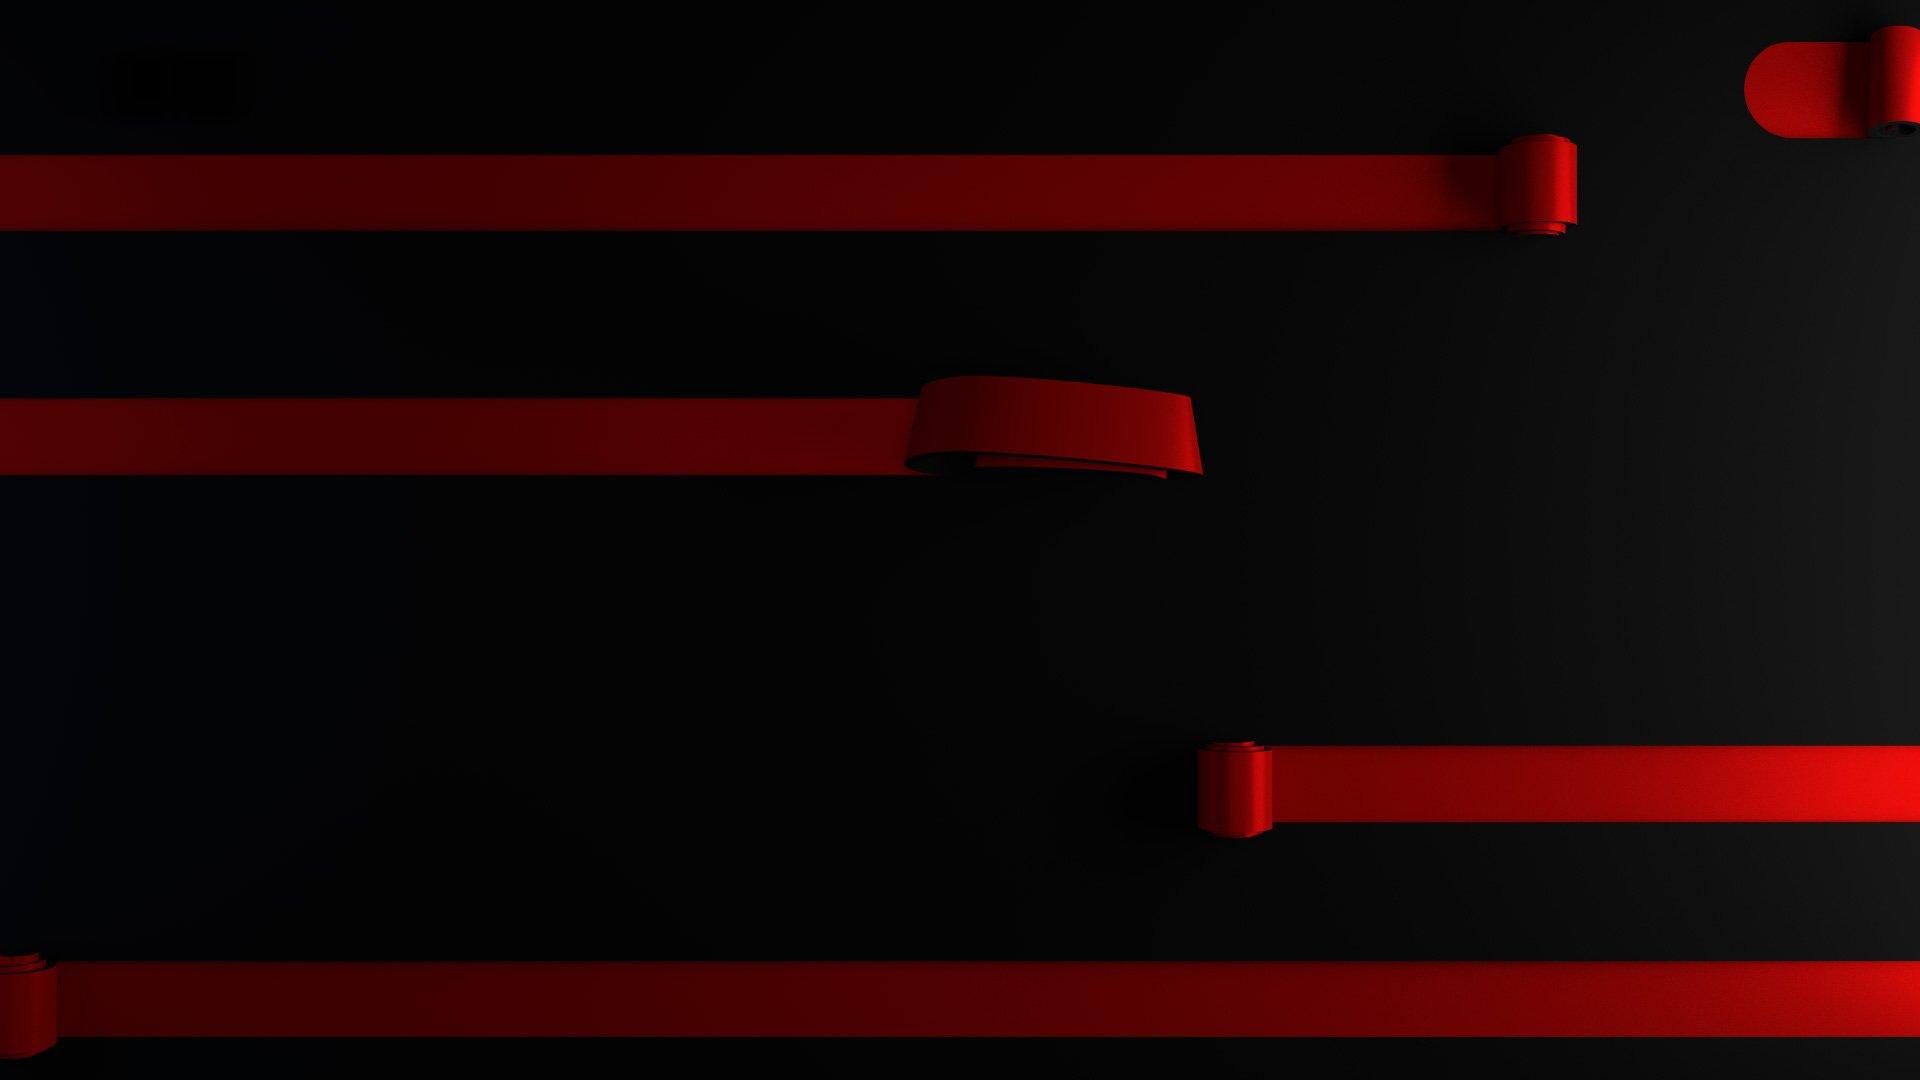 x1bg 3d rolls red black 2 Martin Crownover 1920x1080